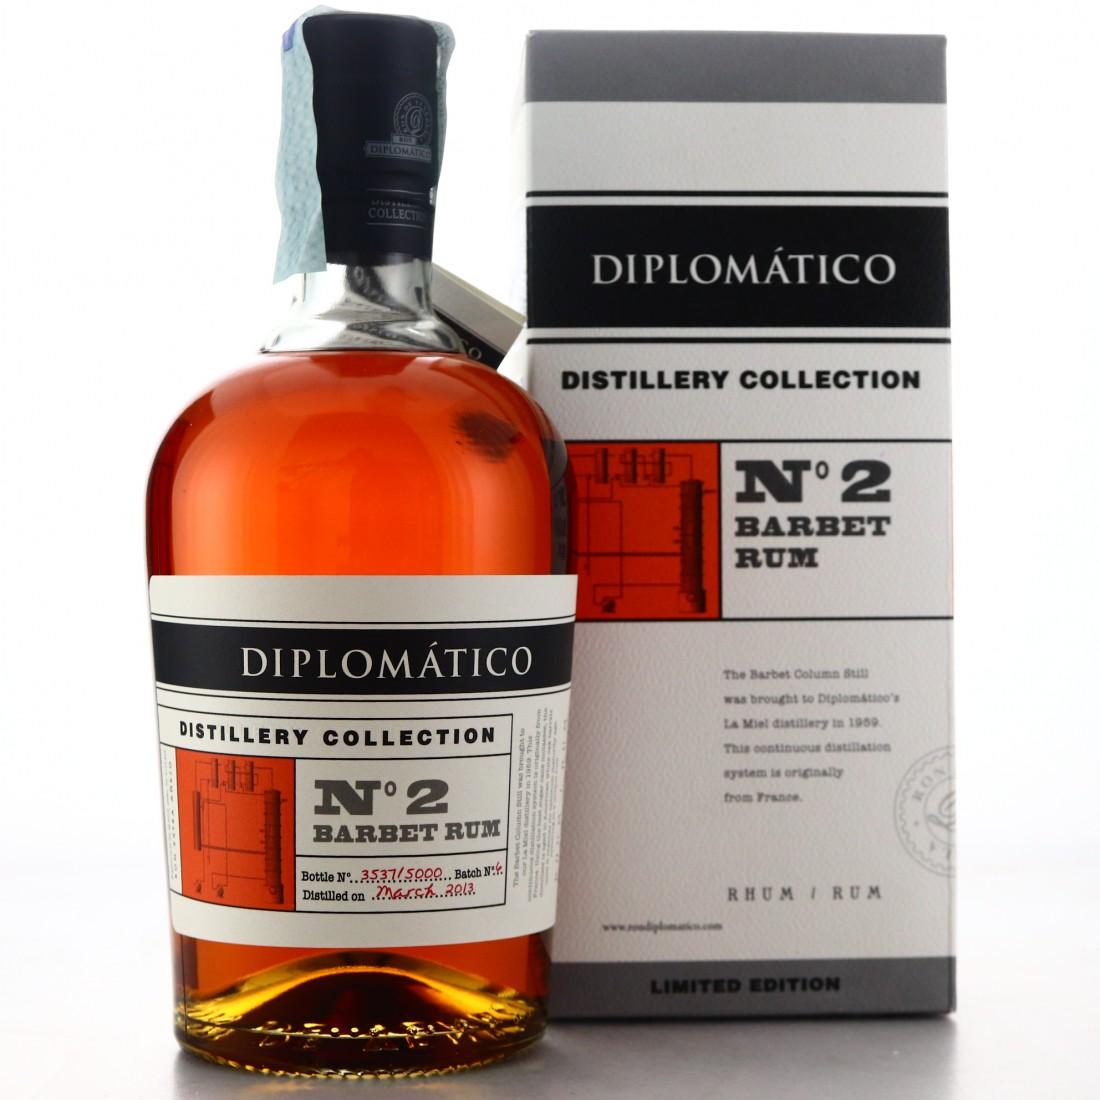 Diplomatico 2013 Distillery Collection No.2 / Barbet Rum